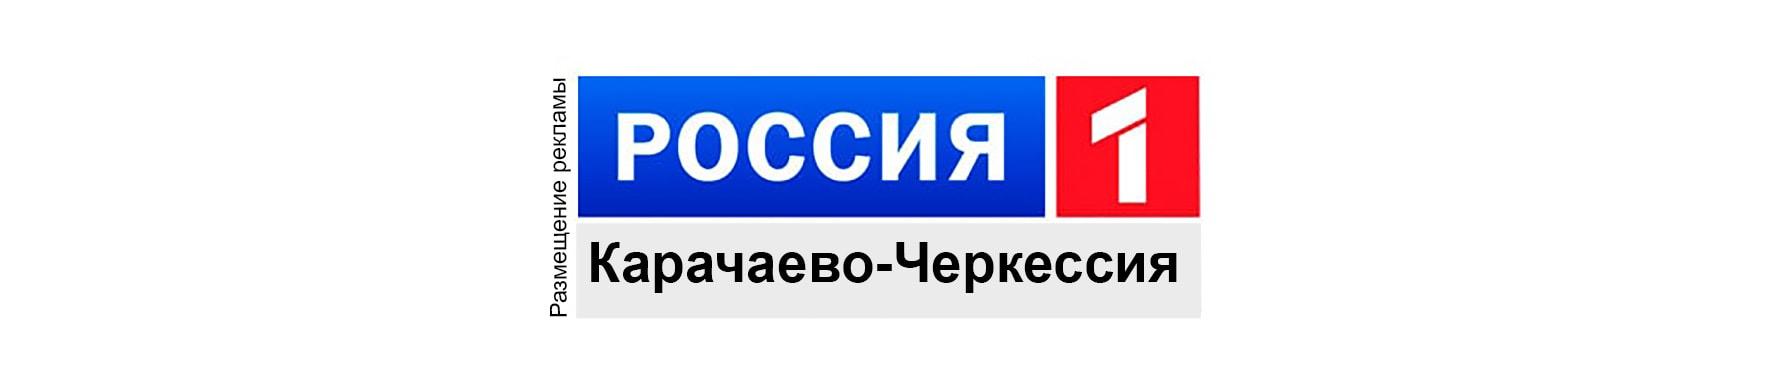 Реклама на телевидении в Карачаево-Черкессии размещение